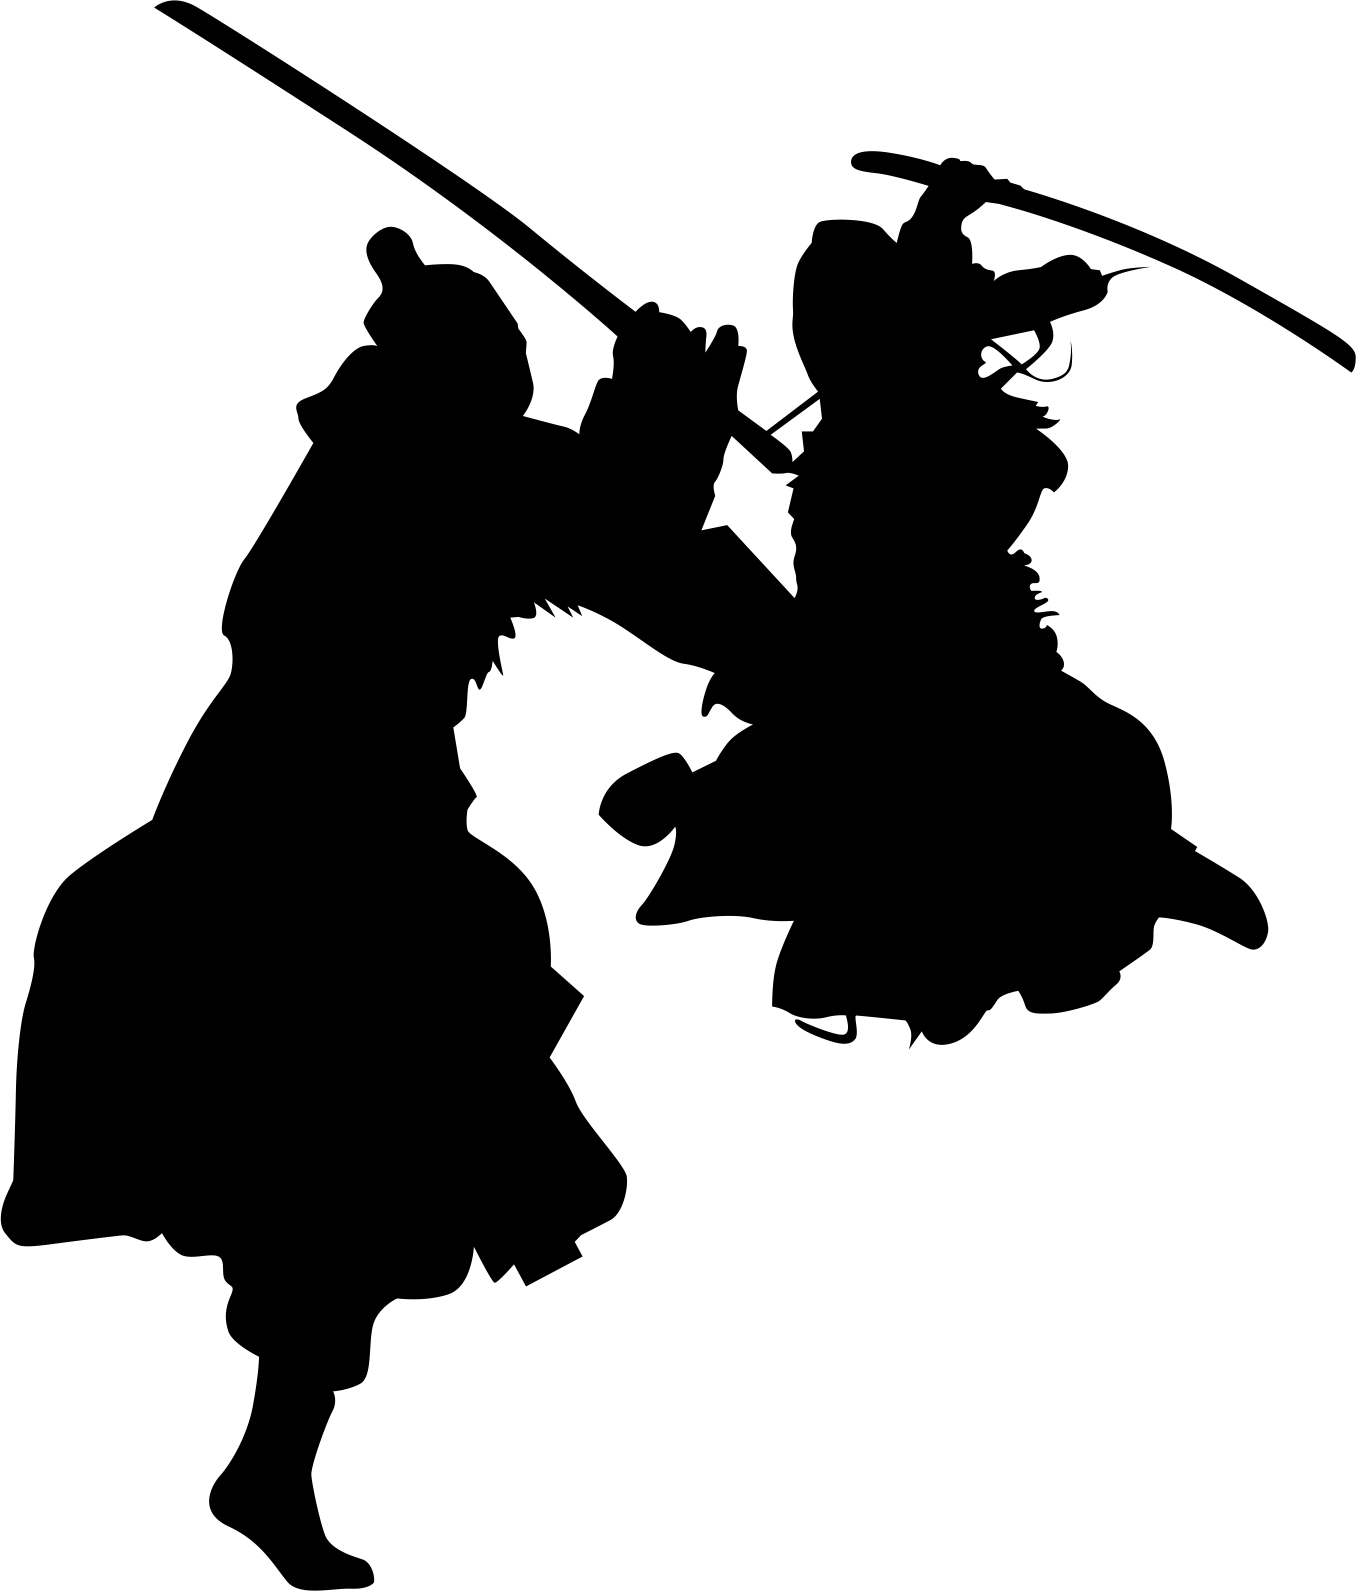 World haidong gumdo federation. Clipart sword silhouette